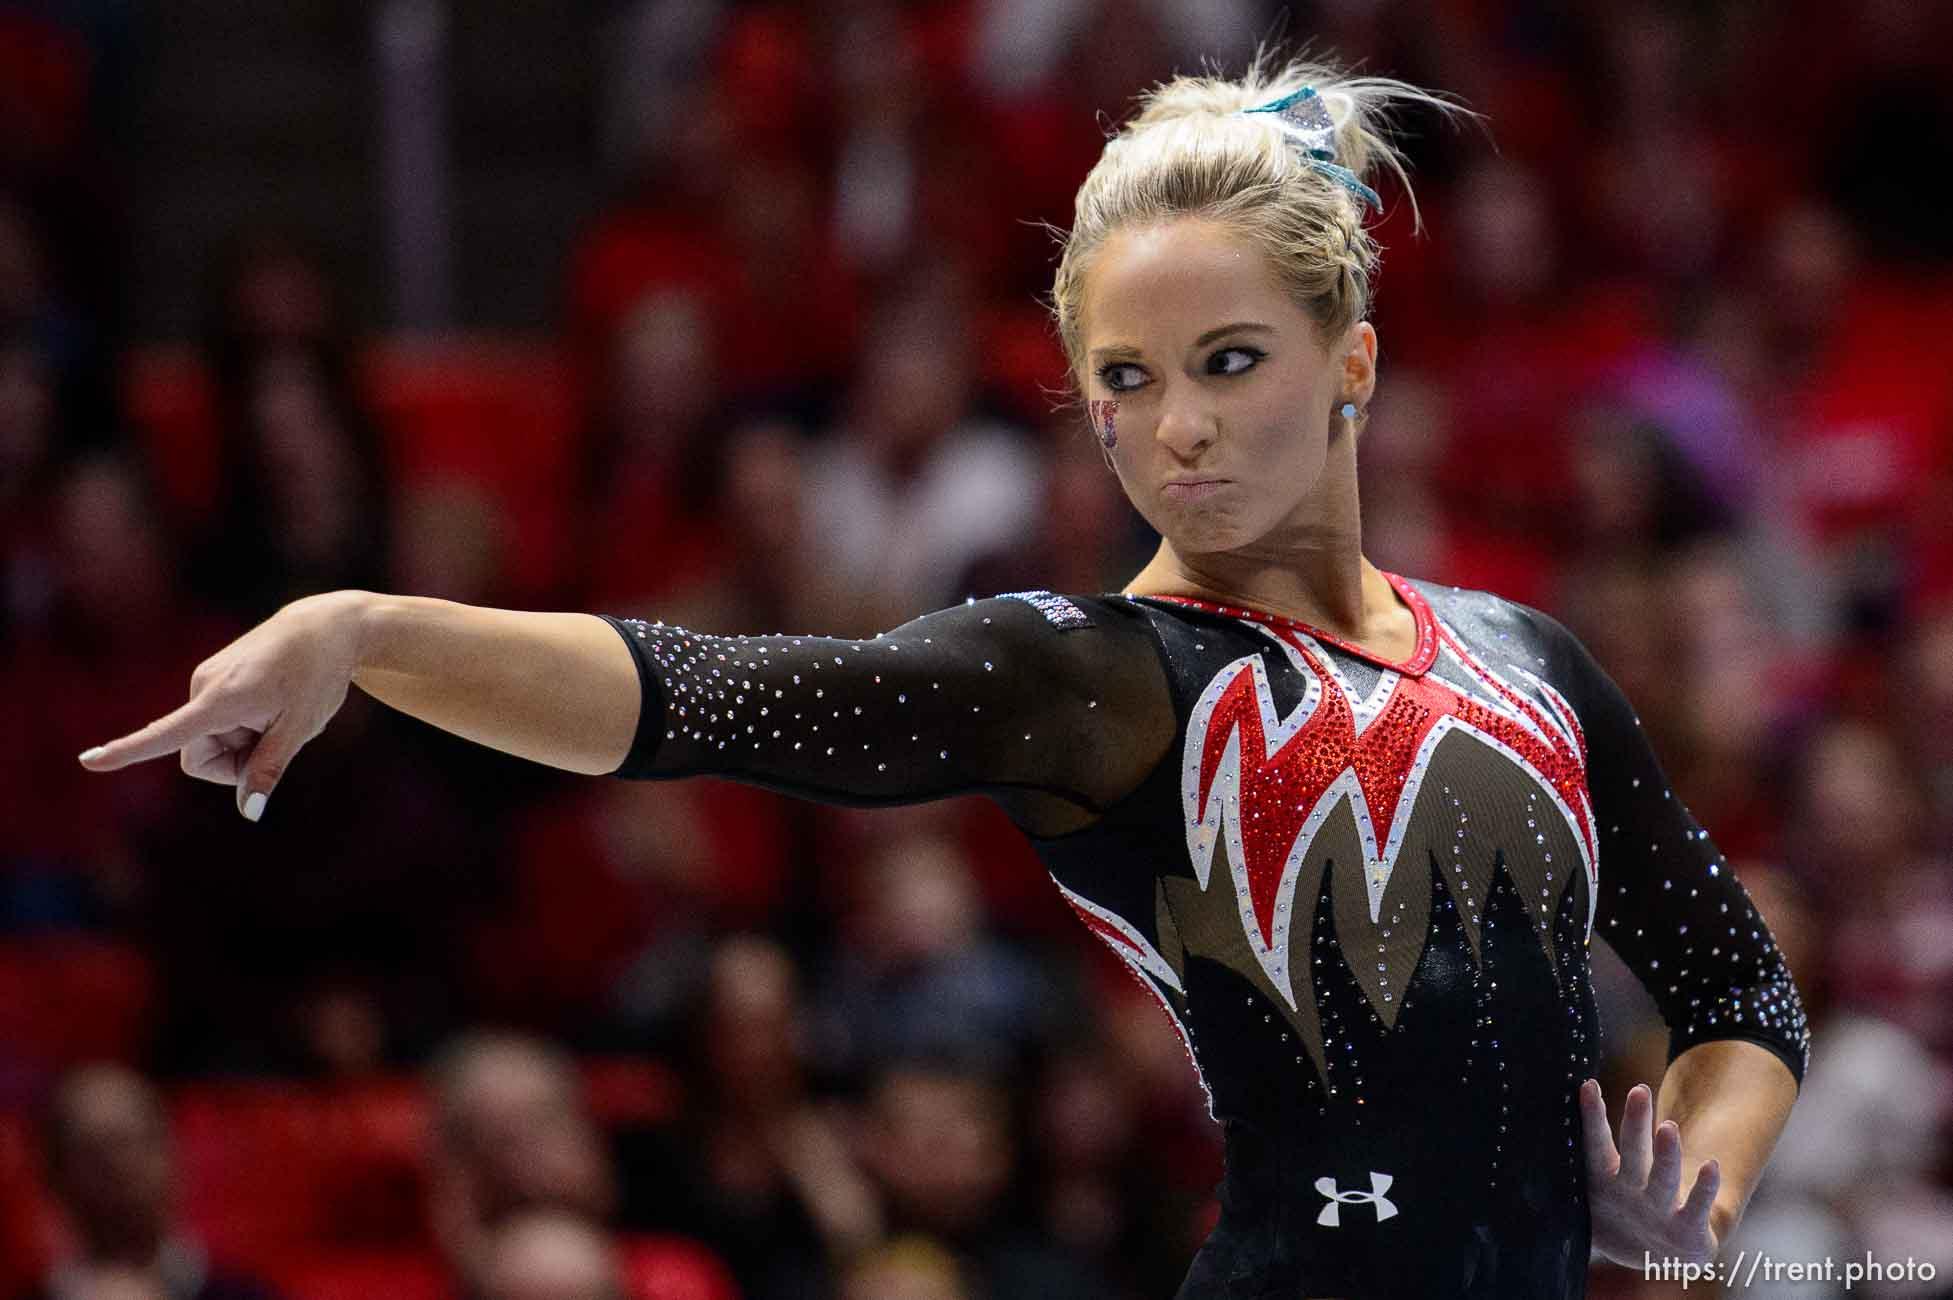 (Trent Nelson | The Salt Lake Tribune) MyKayla Skinner on floor as Utah hosts Washington, NCAA gymnastics in Salt Lake City, Saturday February 3, 2018.